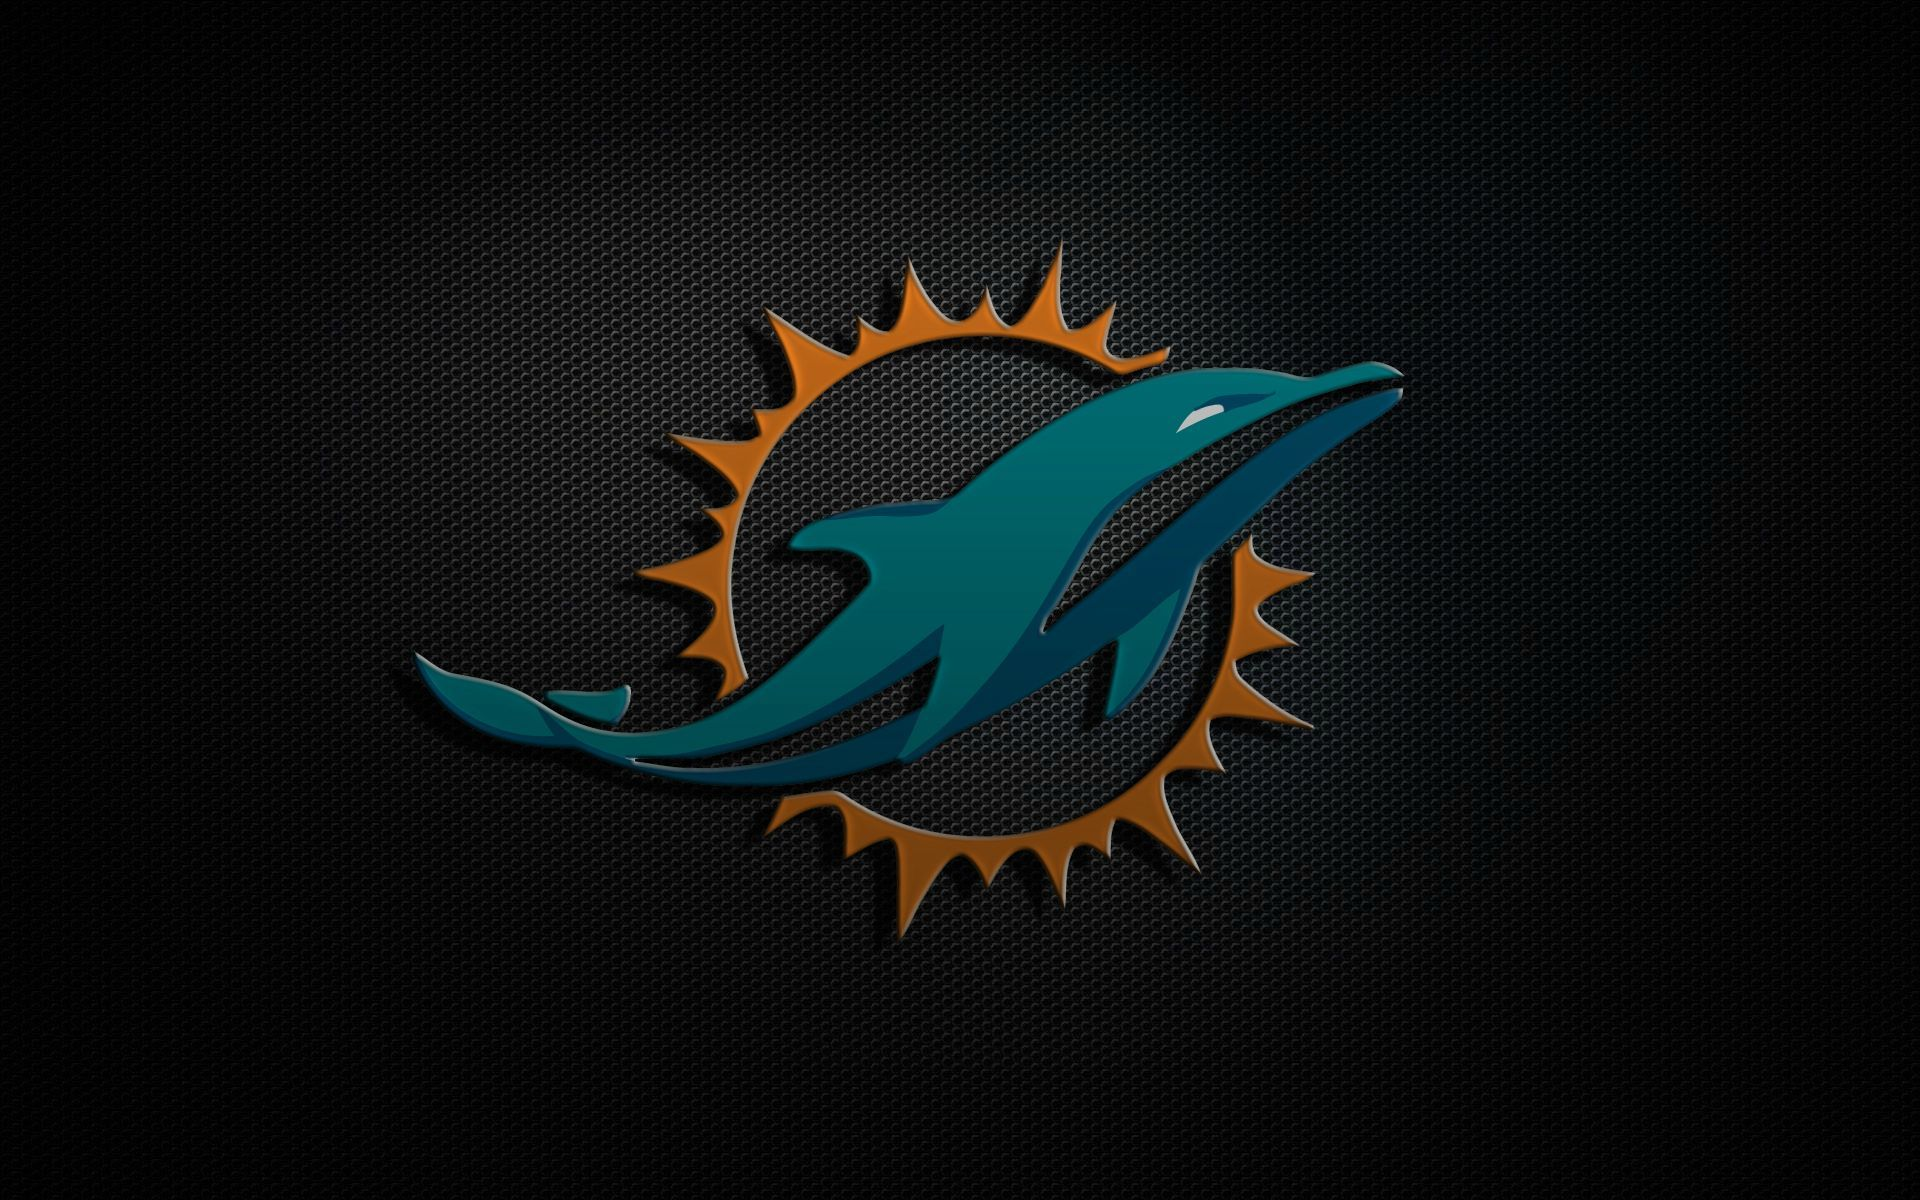 miami dolphins wallpaper - Google Search | NFL Logo | Pinterest